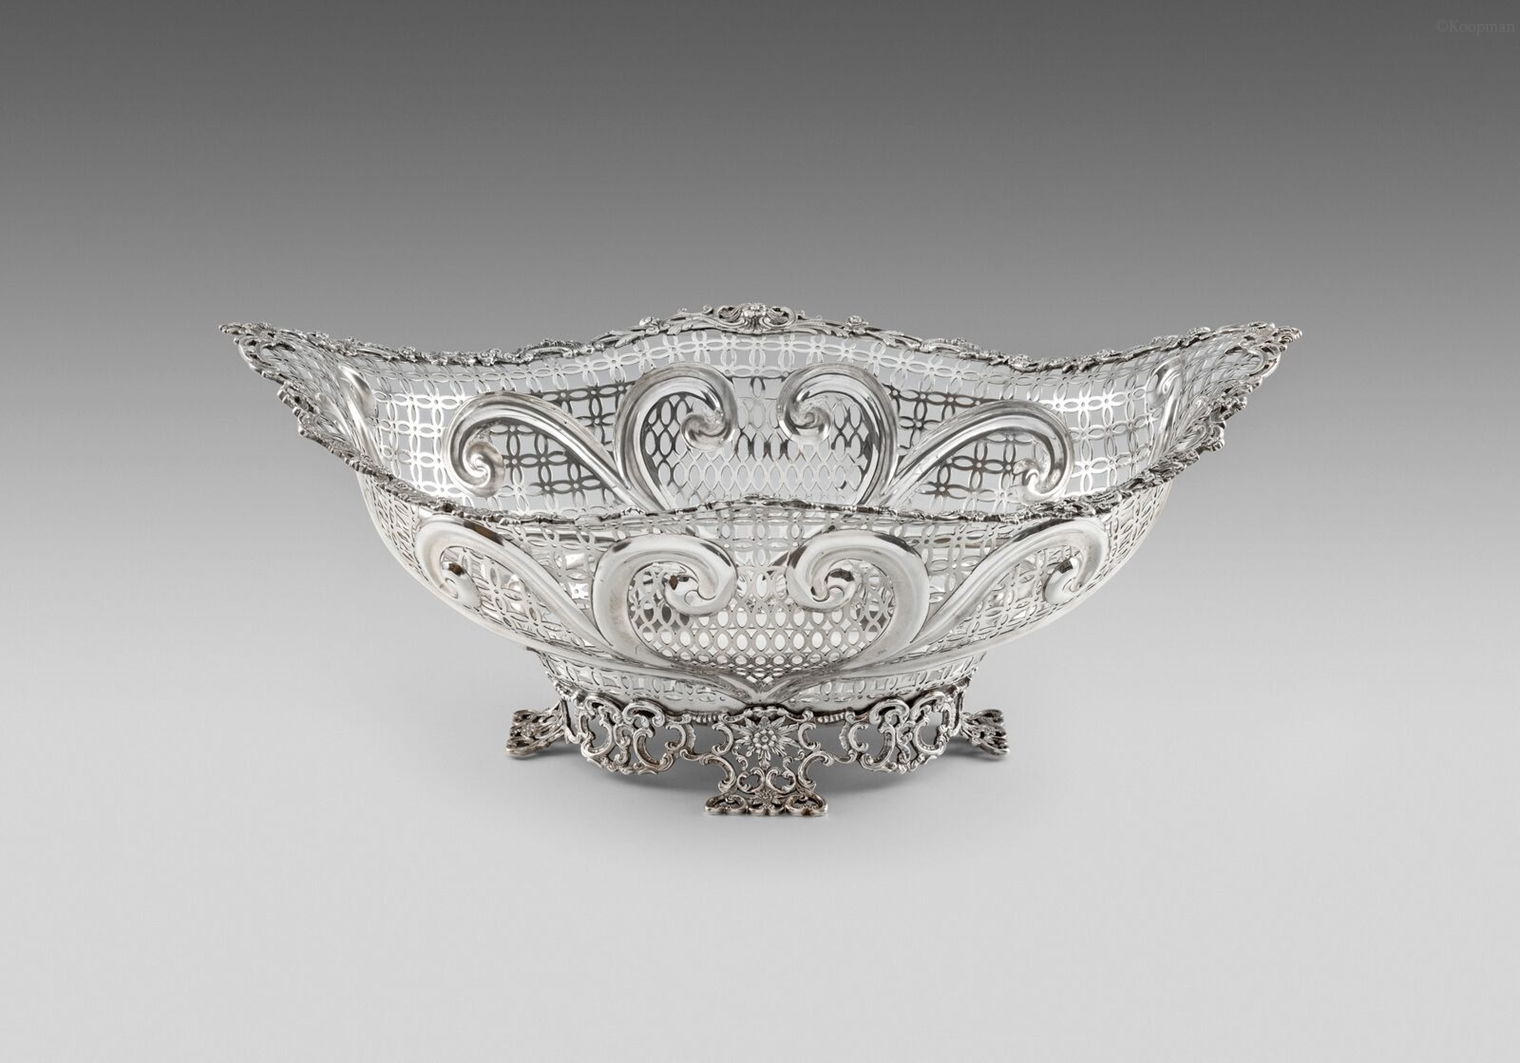 A Monumental Victorian Basket Centrepiece